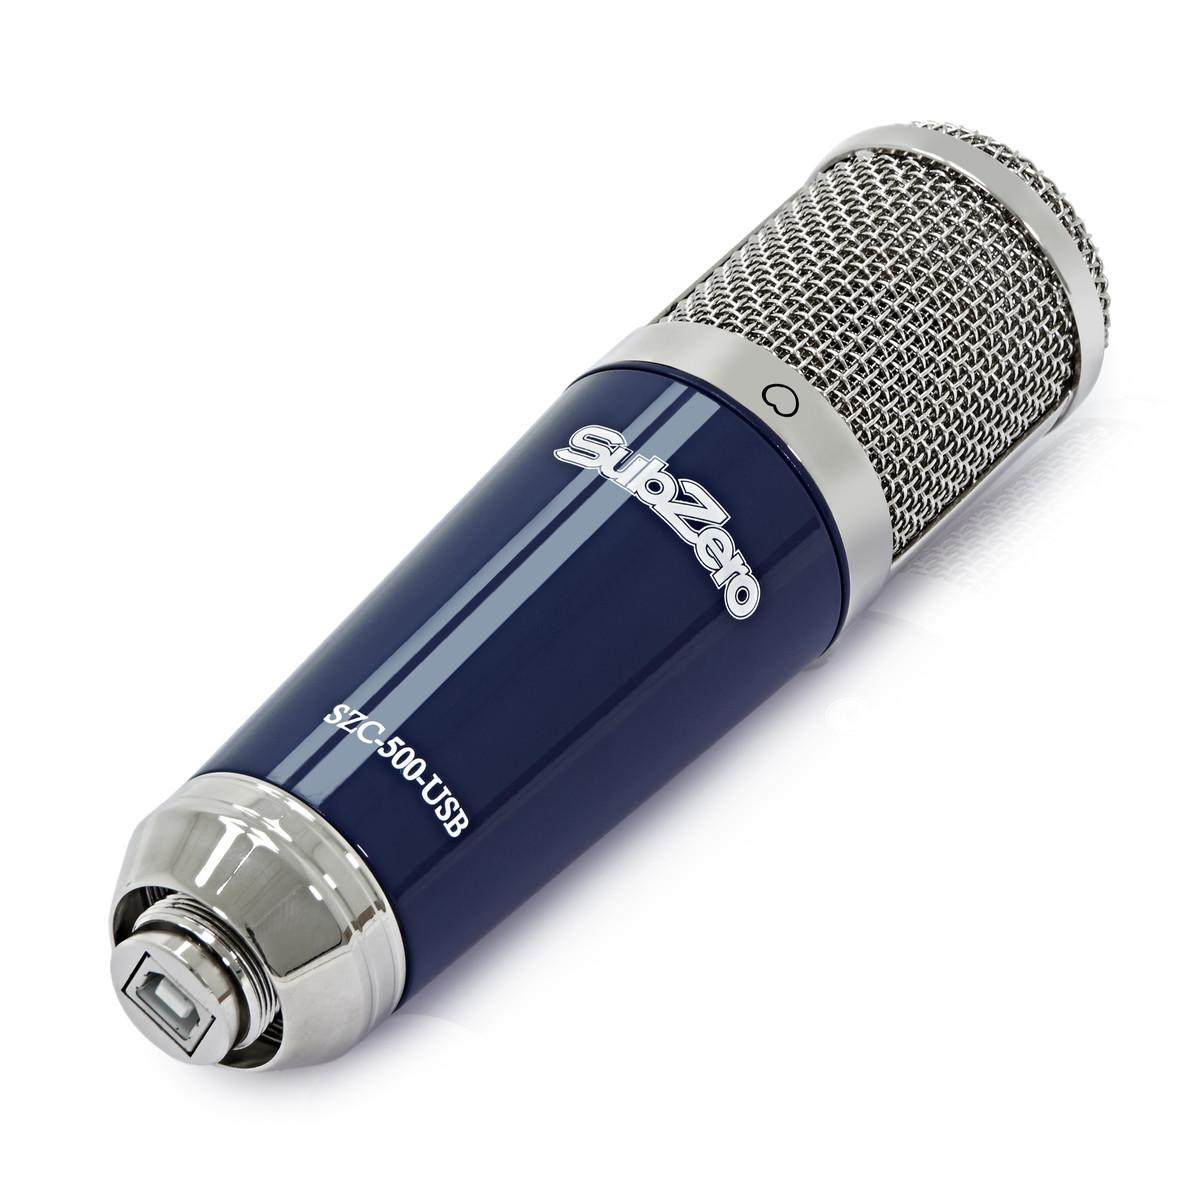 subzero szc 500 usb condenser microphone recording pack at. Black Bedroom Furniture Sets. Home Design Ideas